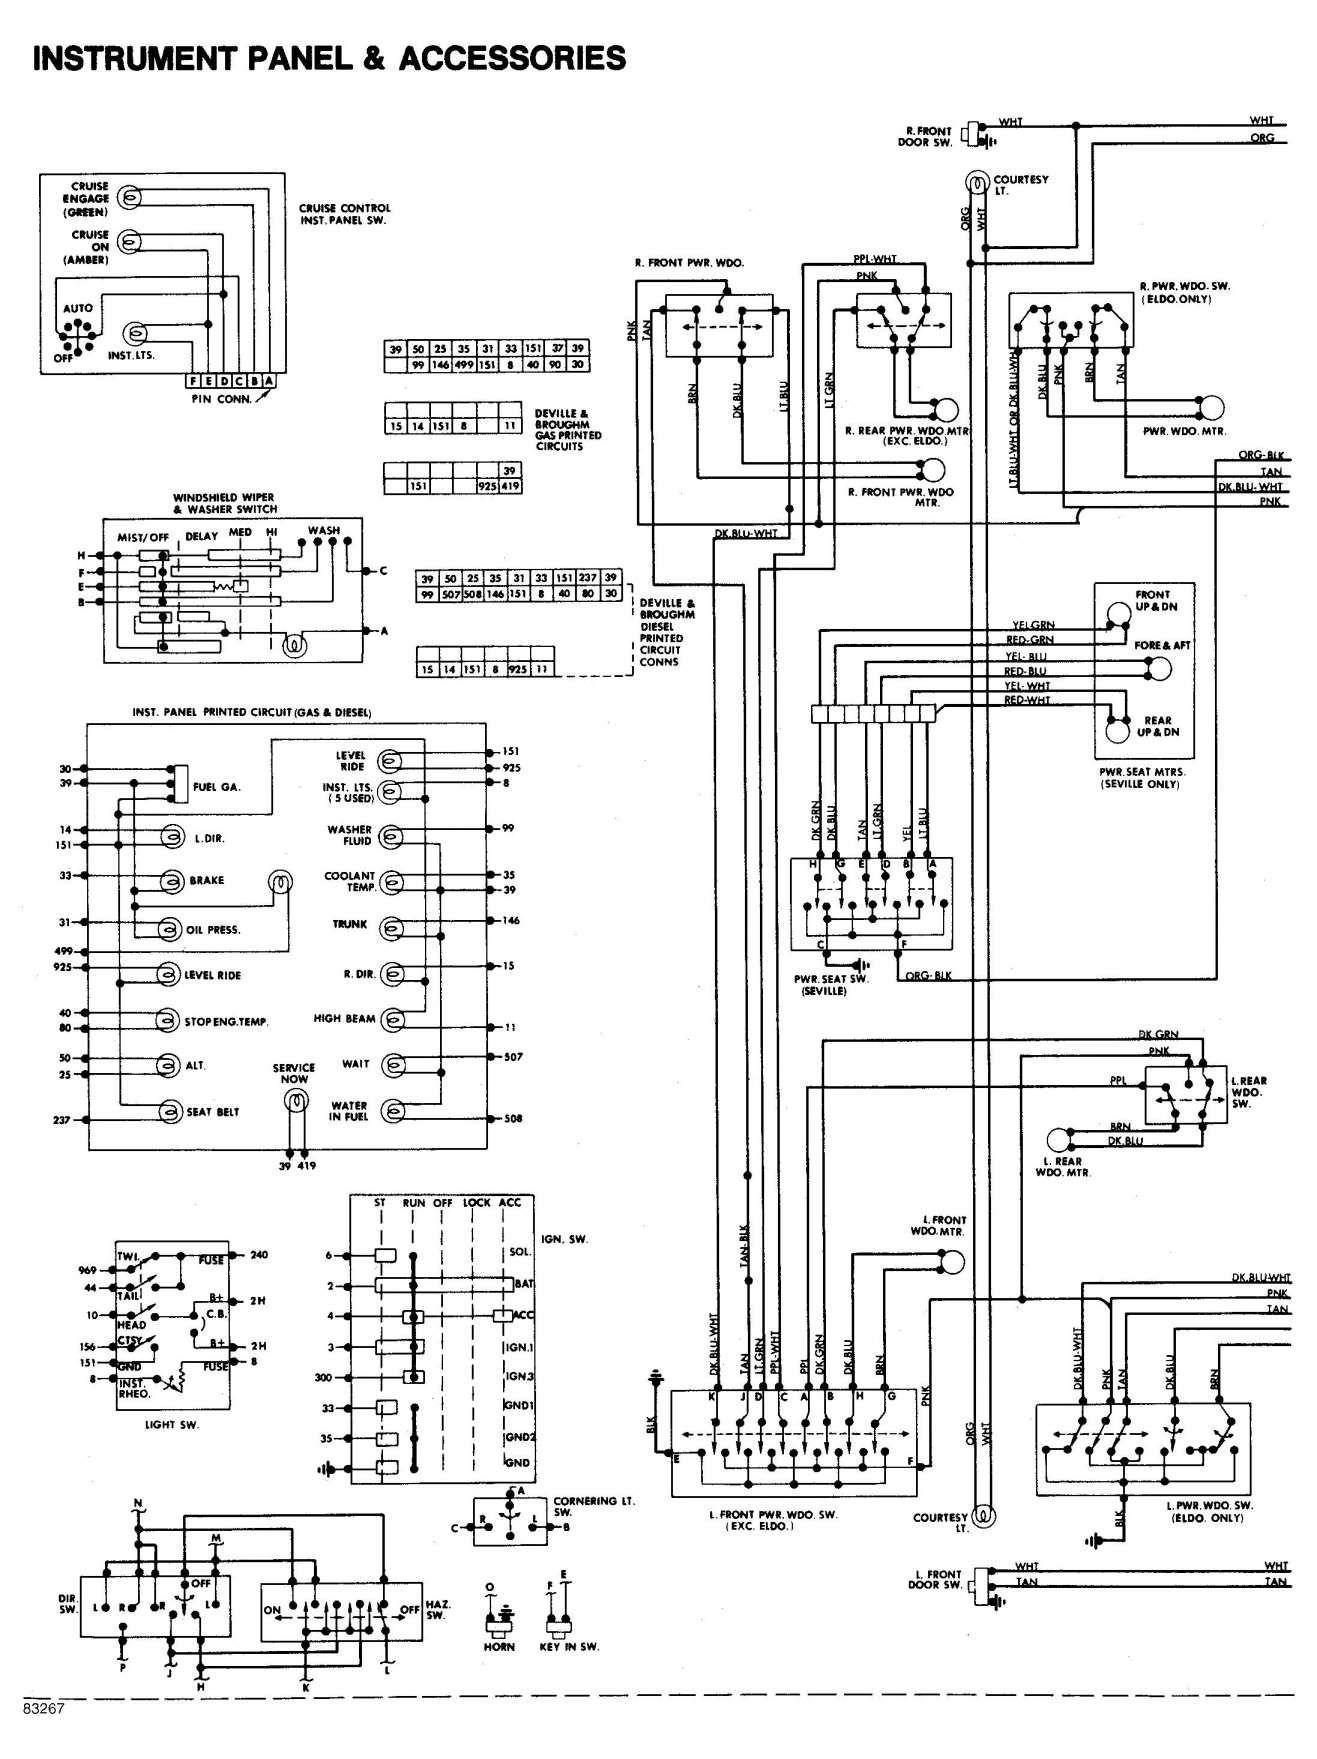 1990 Honda Accord Wiring Diagrams Automotive Wiring Diagram View A View A Zaafran It